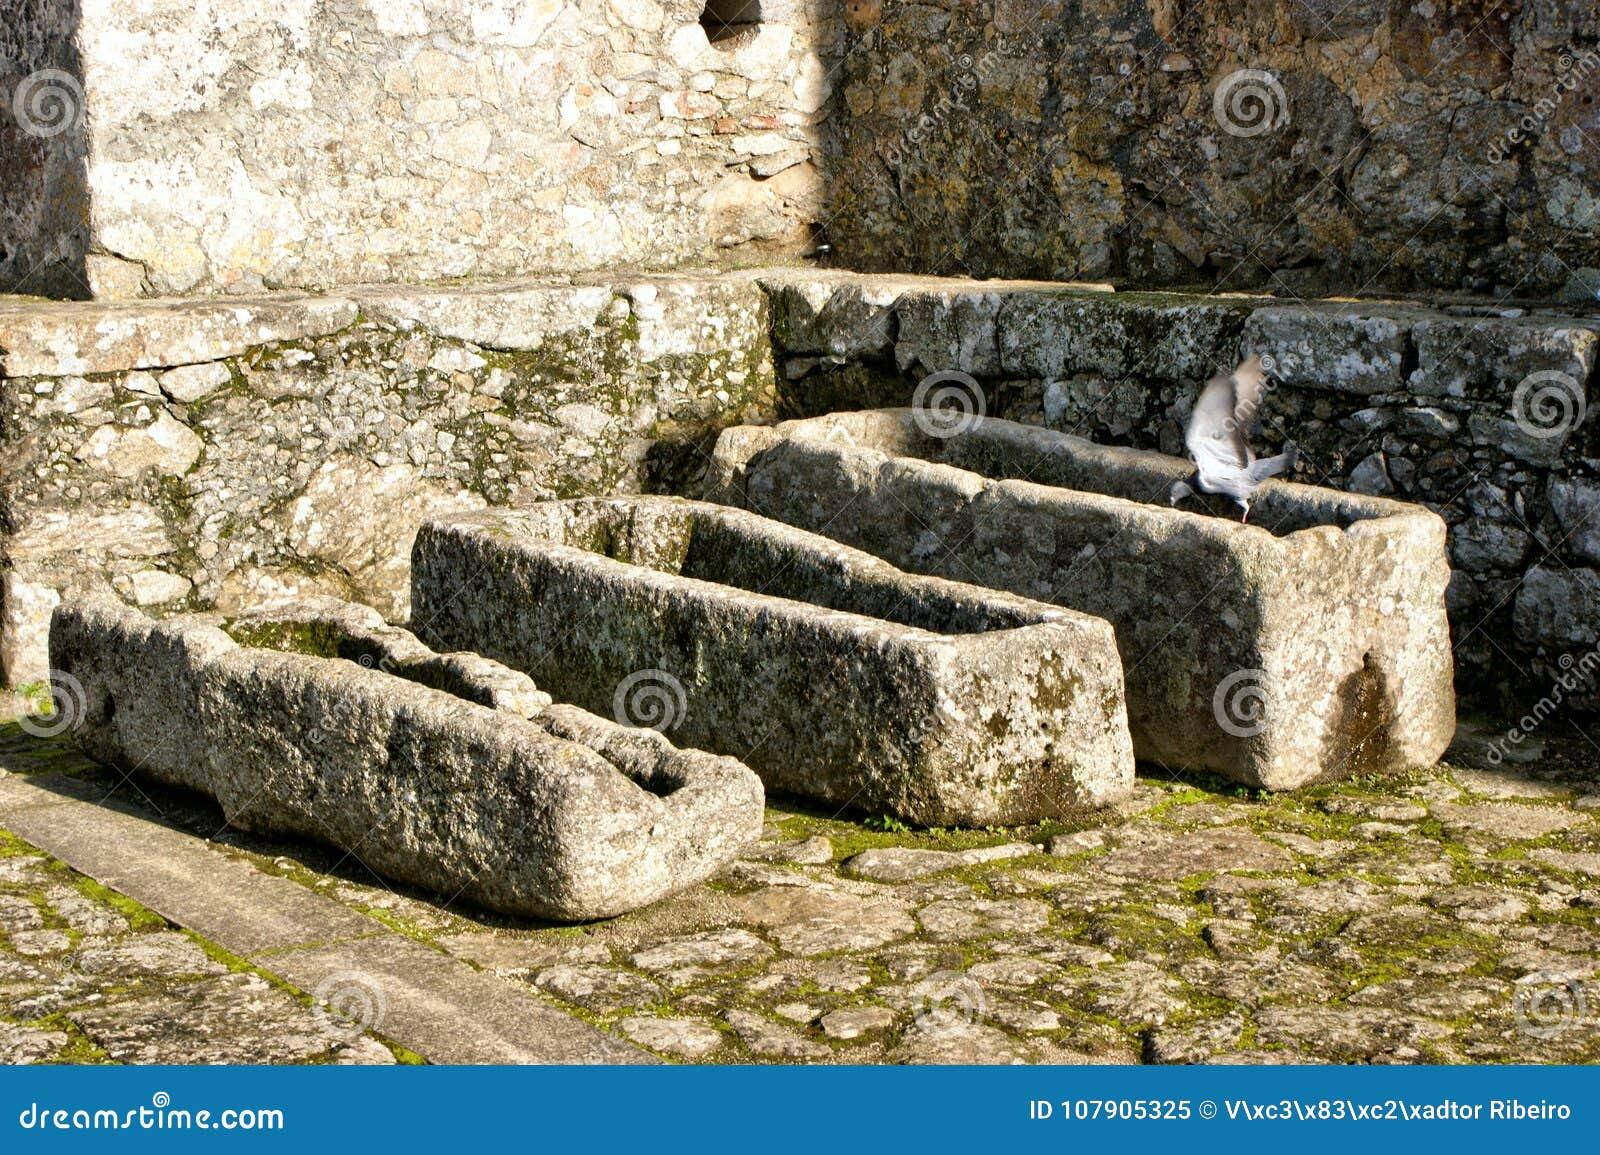 Ancient tombs in Santa Maria da Feira castle